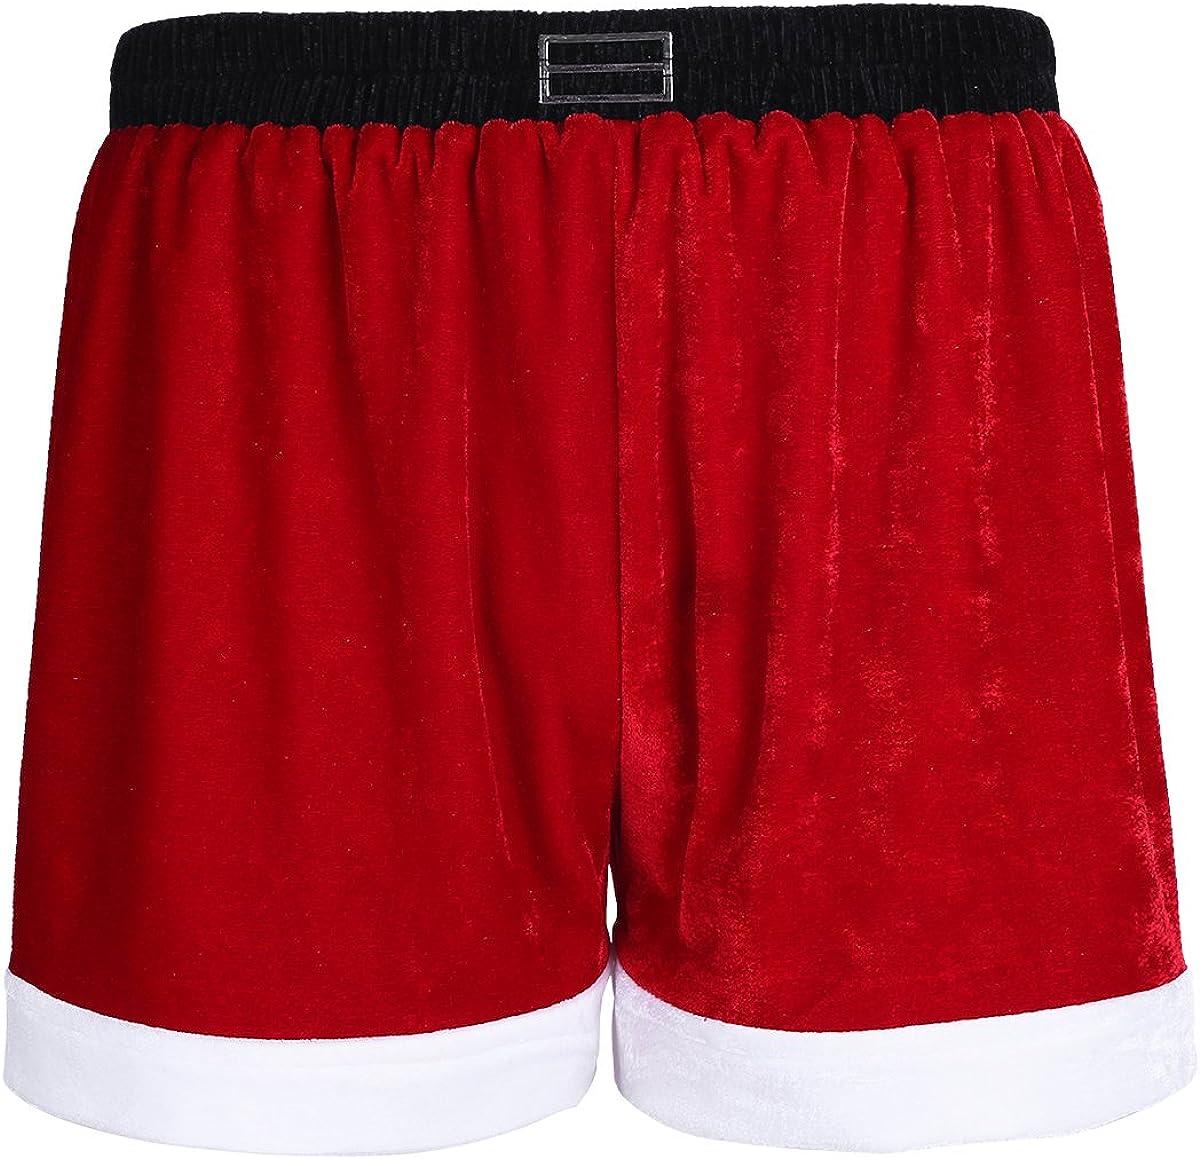 Nimiya Men's Red Velvet Christmas Popular product Santa Boxer Brie Max 70% OFF Claus Holiday